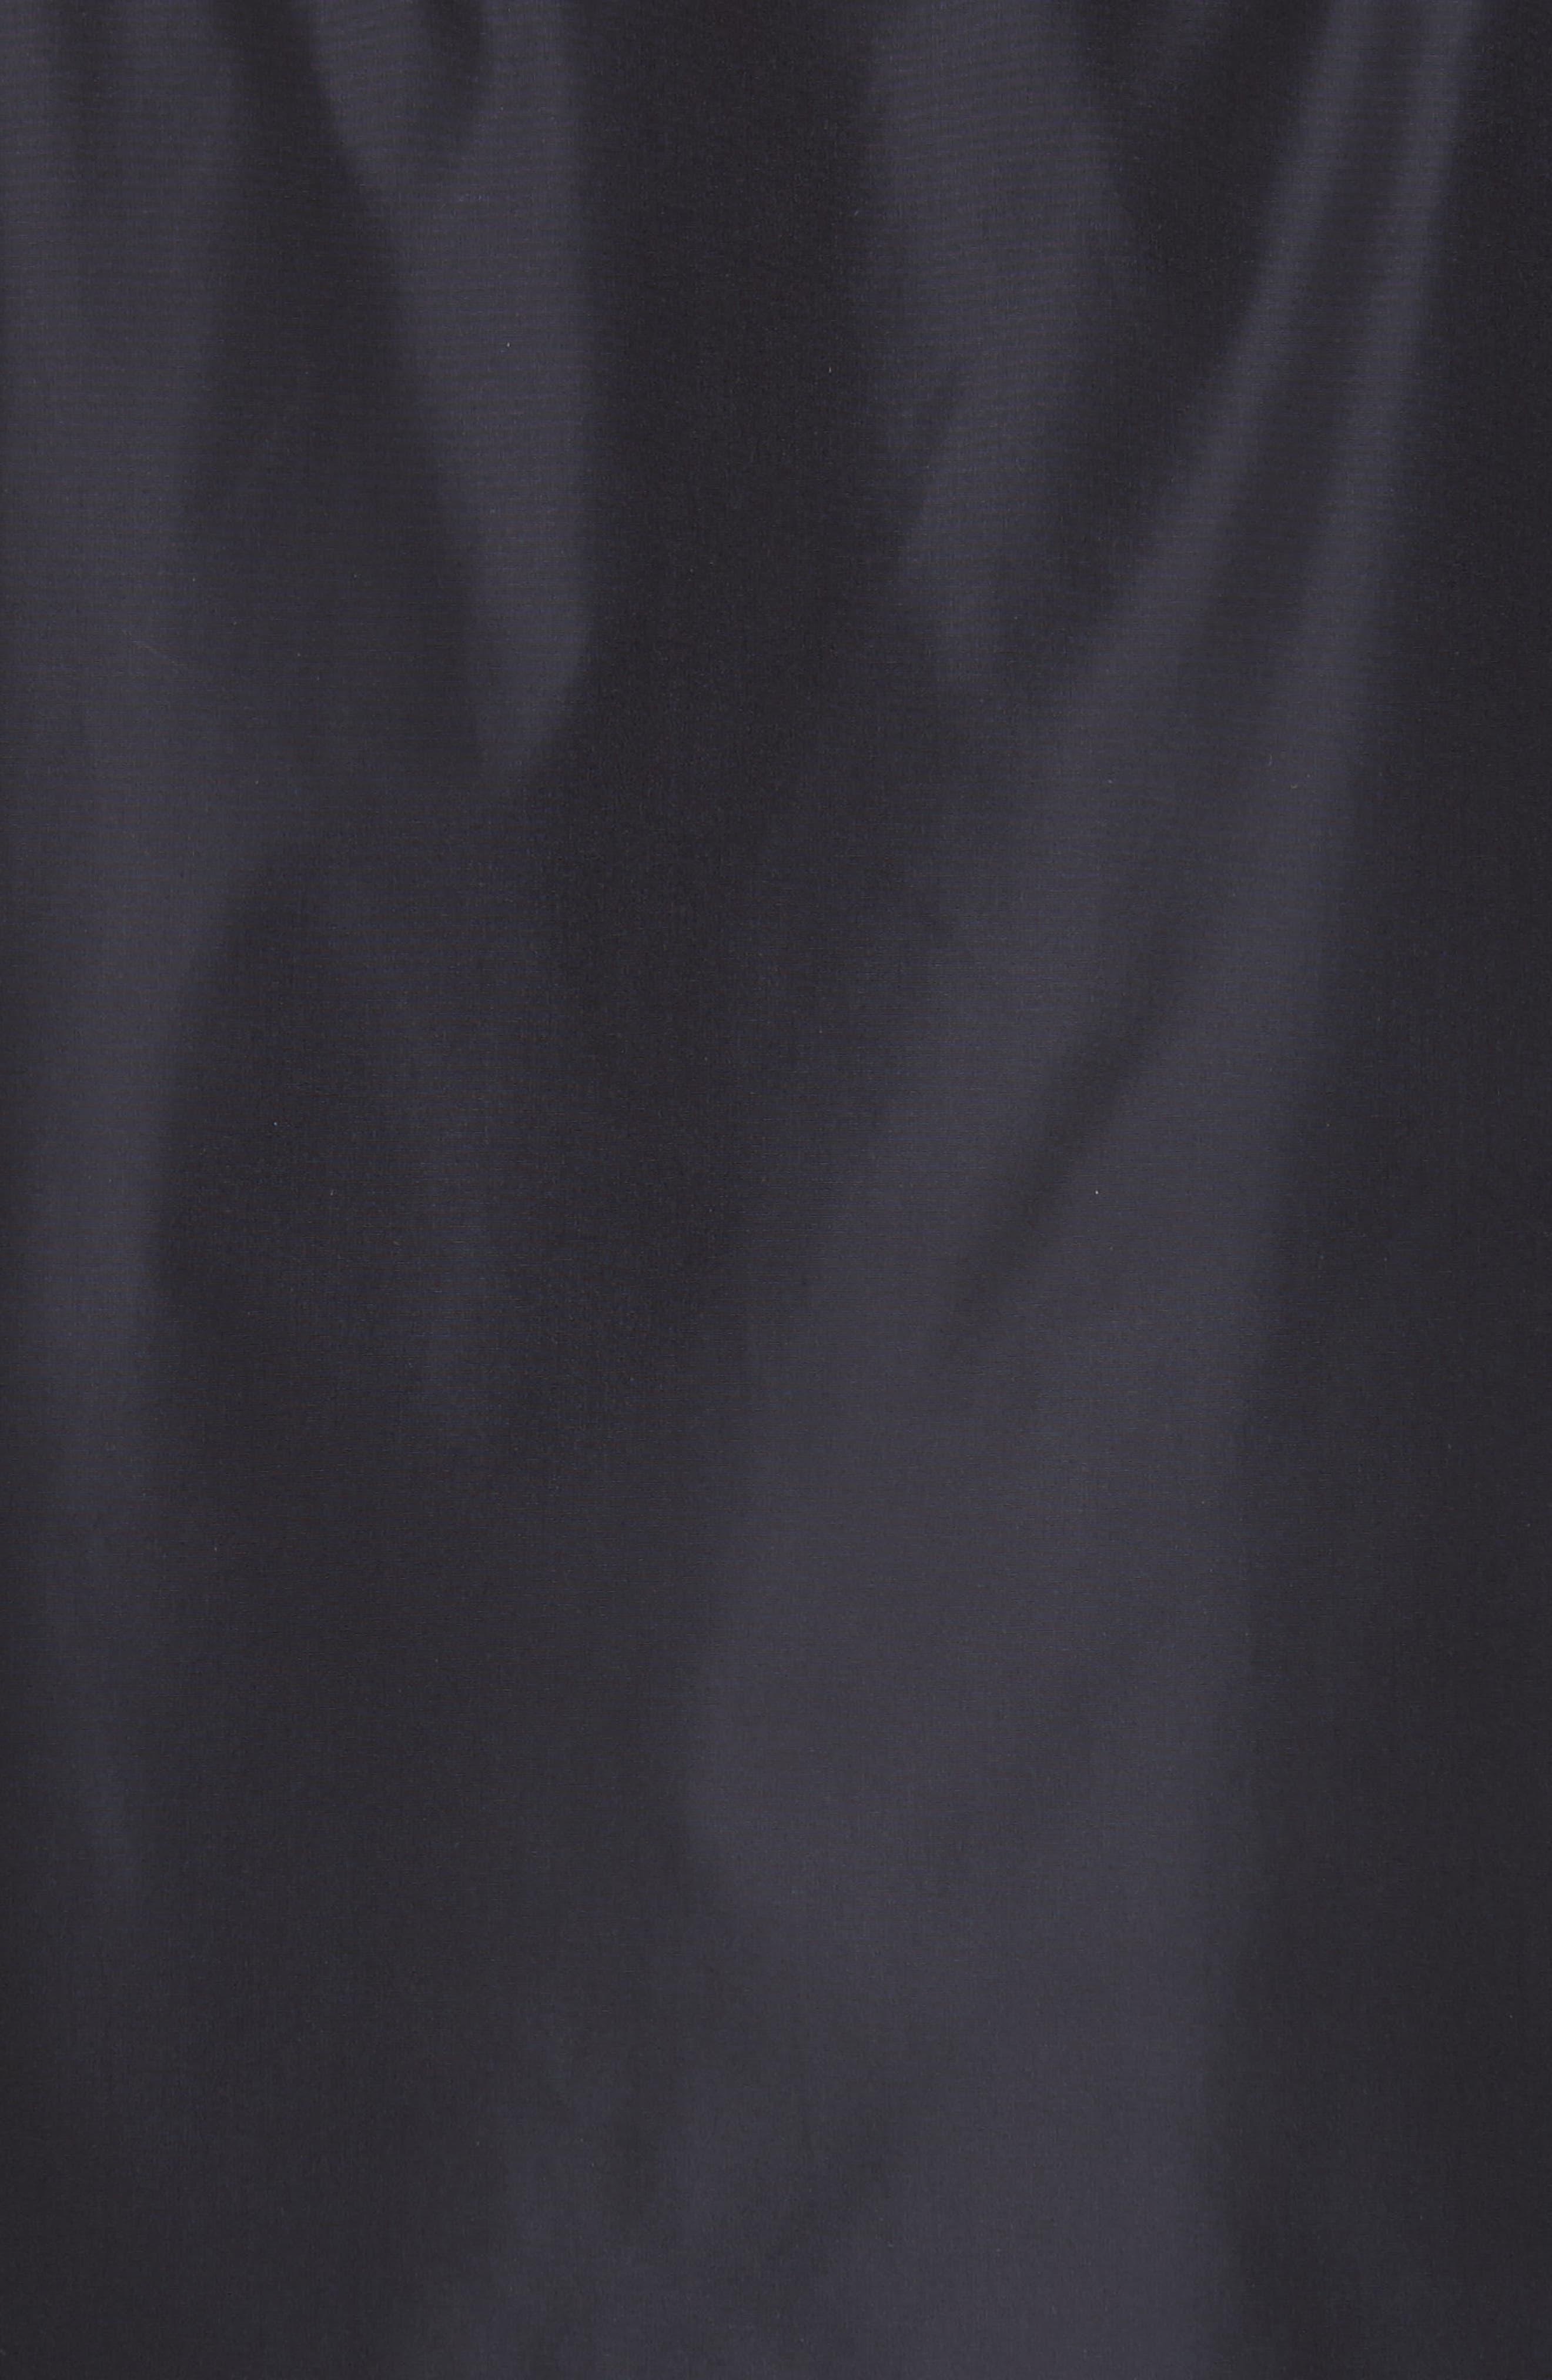 Goulier Nylon Jacket,                             Alternate thumbnail 5, color,                             Navy